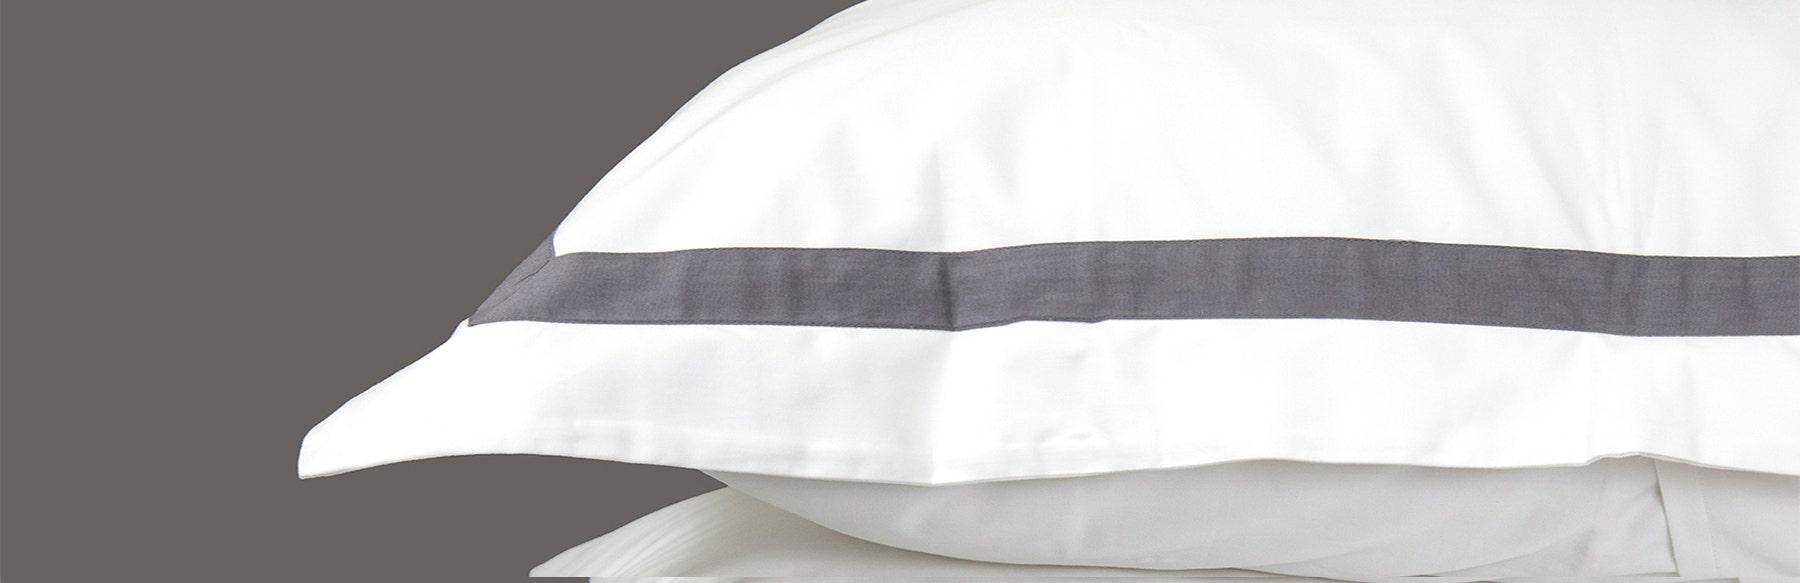 Pillow Cases & Shams